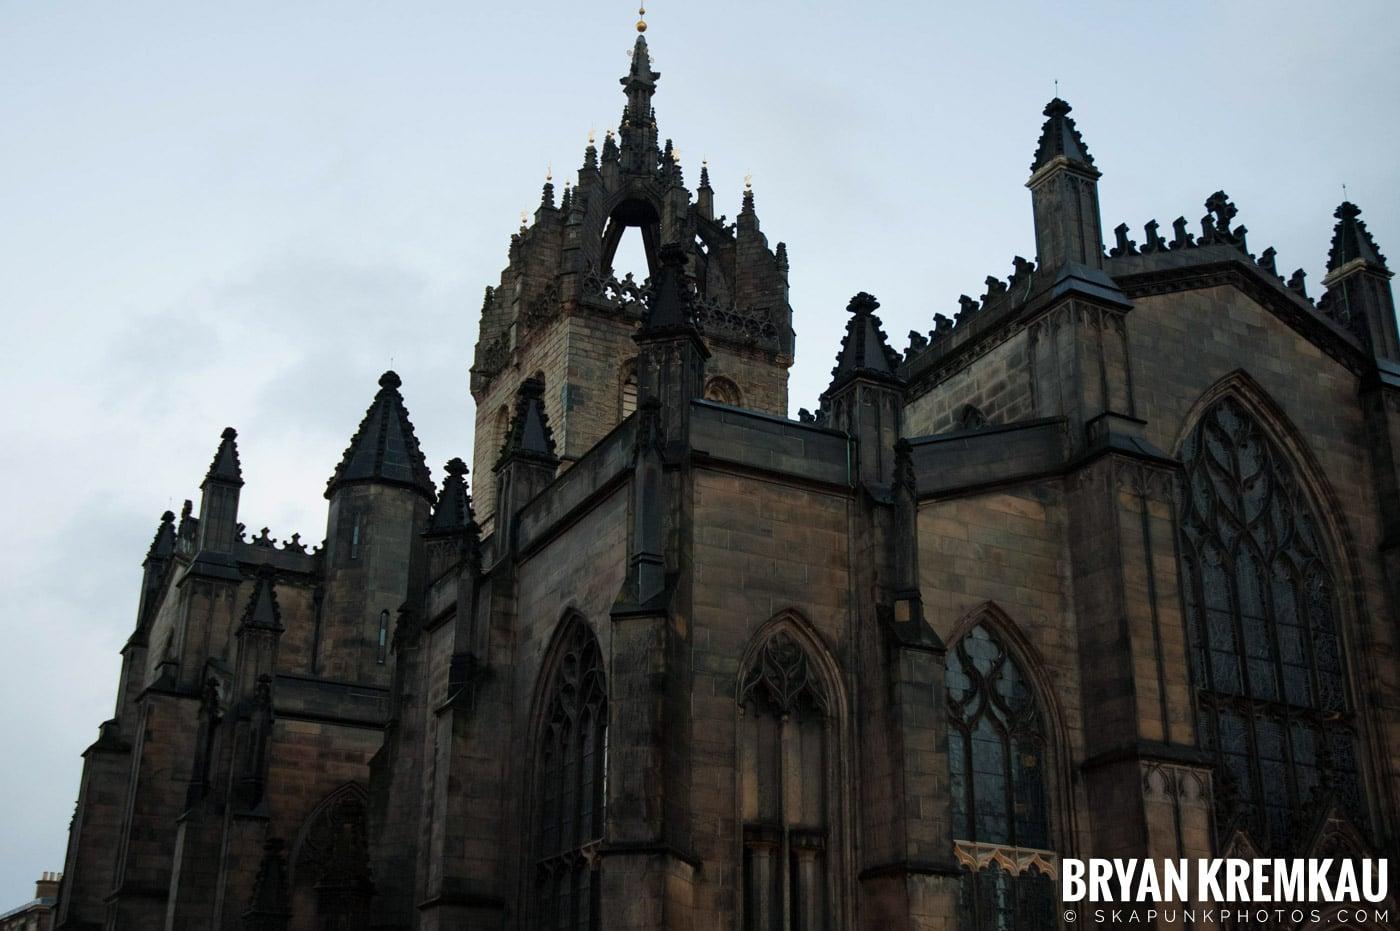 Edinburgh, Scotland - Day 1 - 12.12.06 (20)